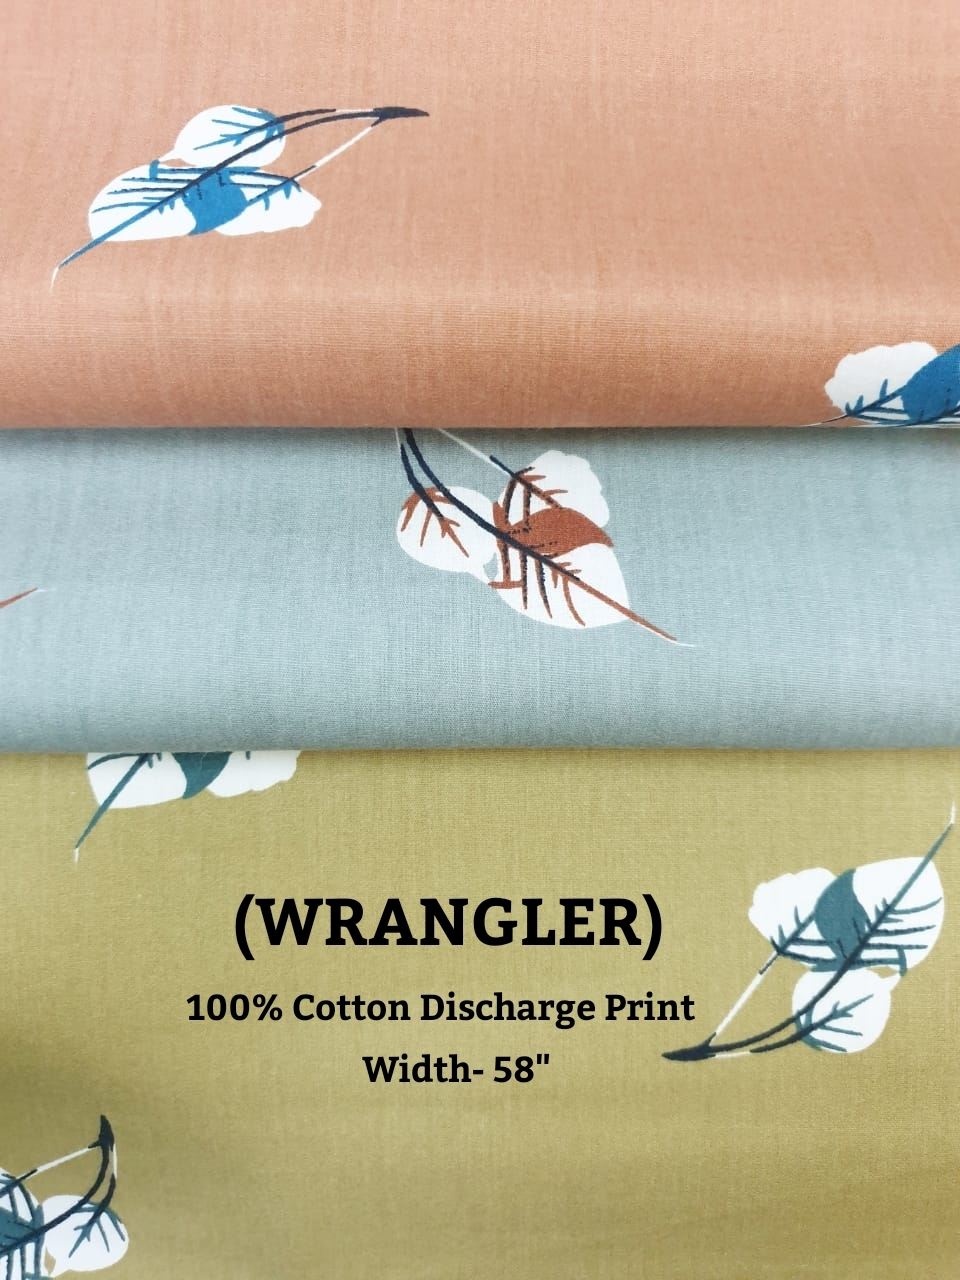 WRANGLER 100% cotton discharge print